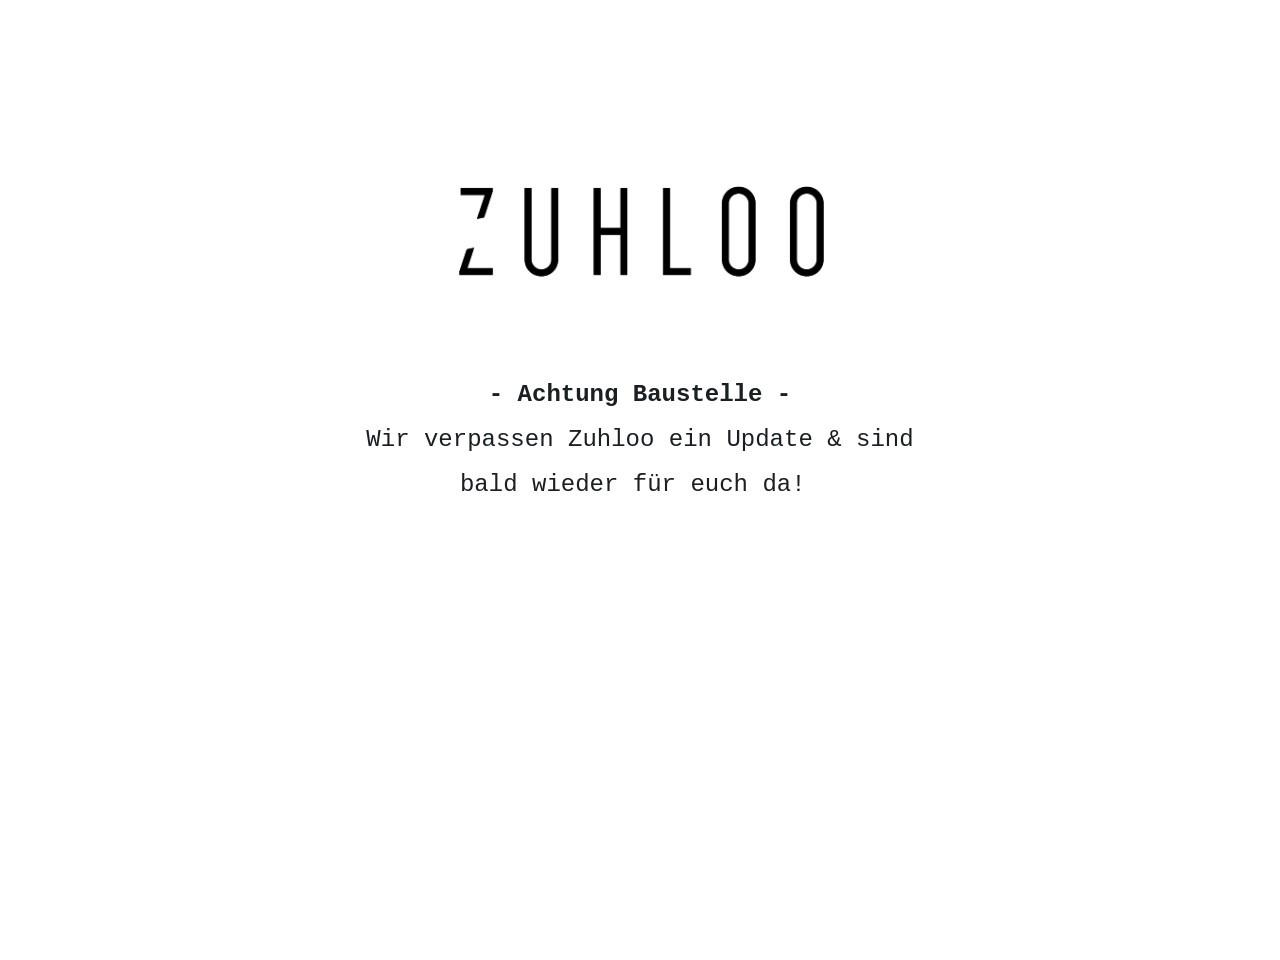 Blogroll |  | Was is hier eigentlich los? | wihel.de